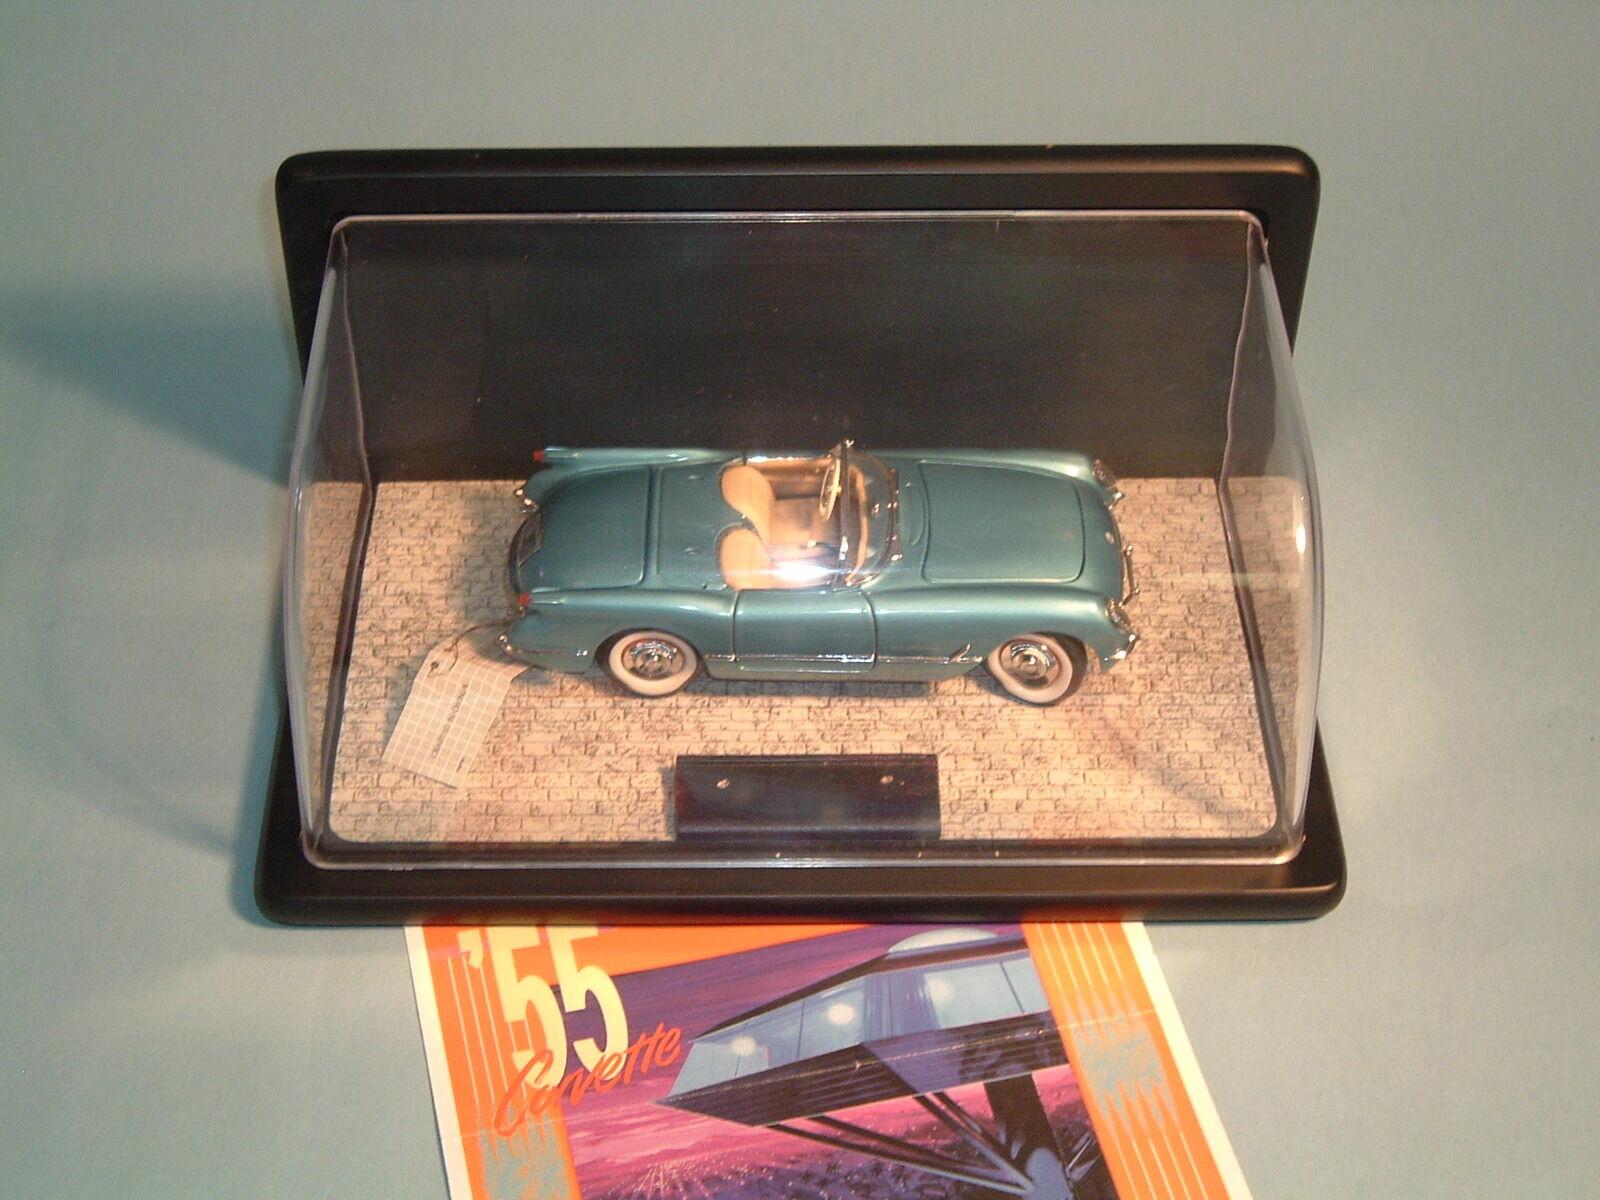 CORVETTE 1955 CHEVROLET PENNANT blueE CORVETTE FRANKLIN MINT 1 24 DIECAST & DSPLY